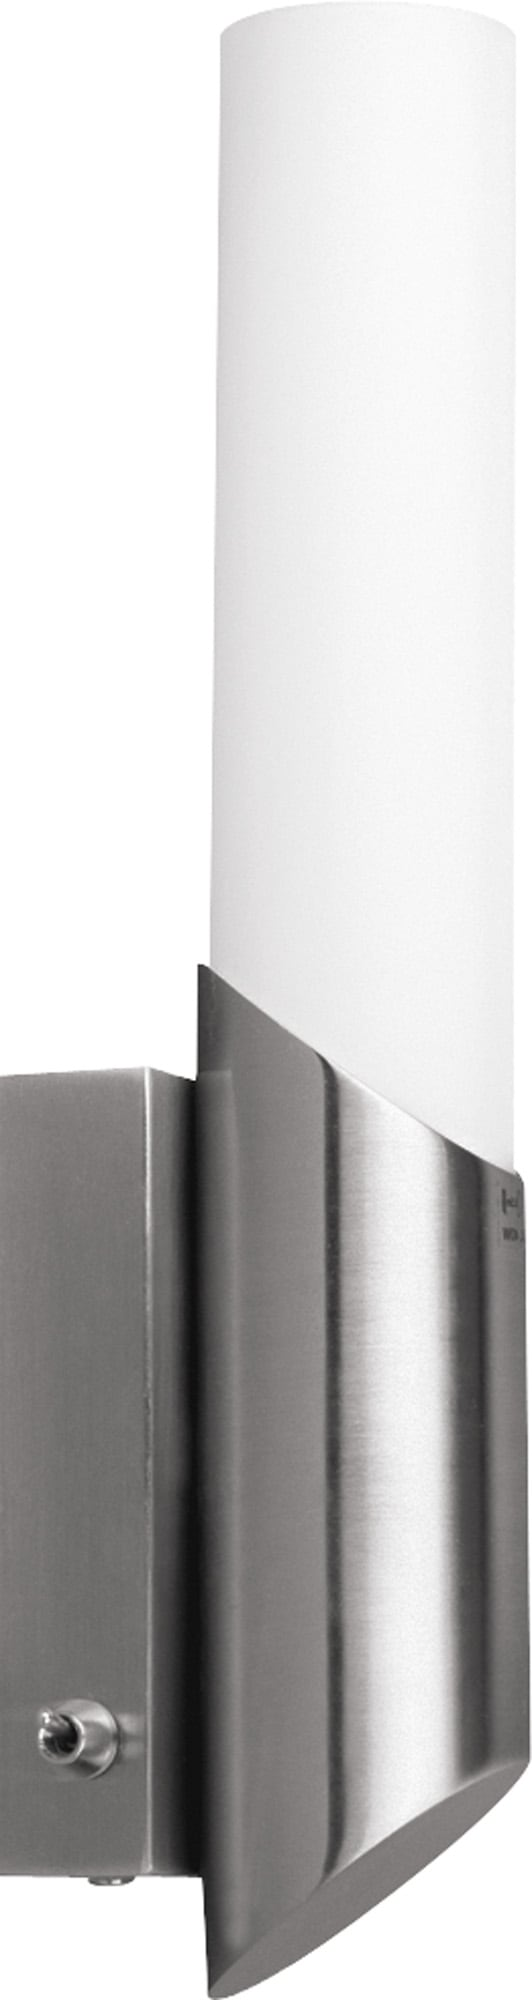 Satin wall lamp Aquatic satin / white E14 40W